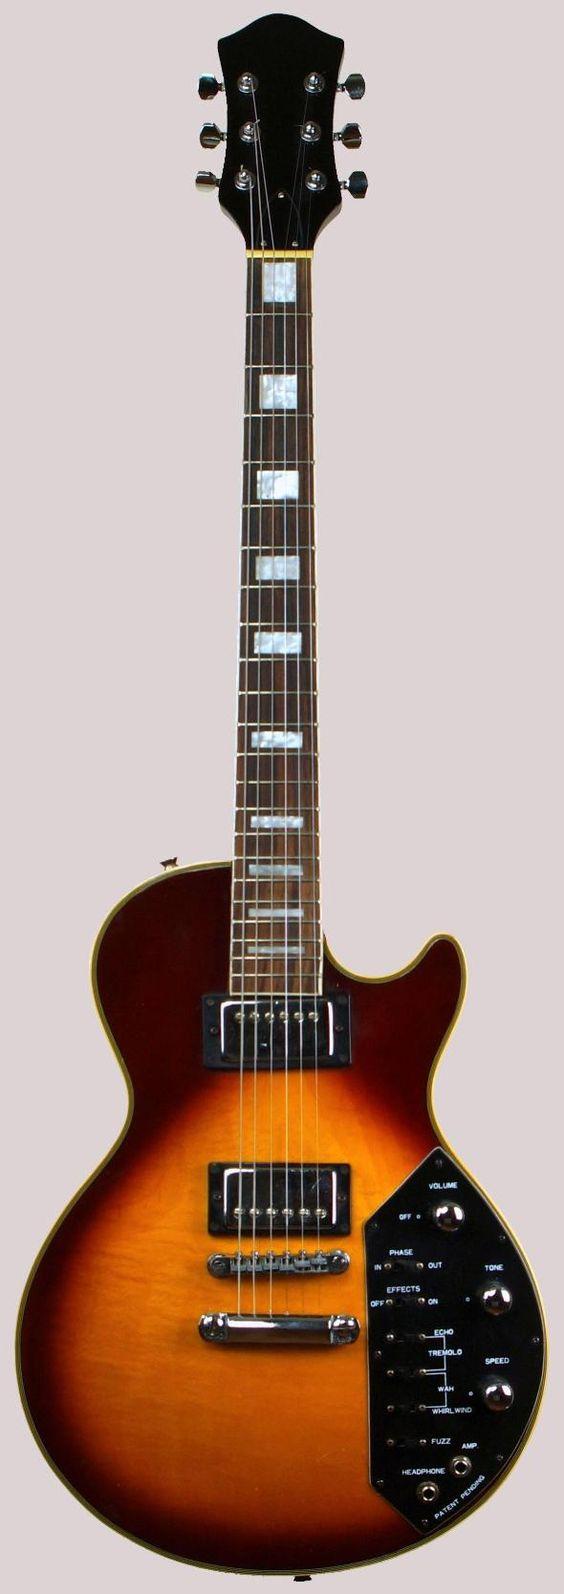 kay univox matsumoto effector guitar